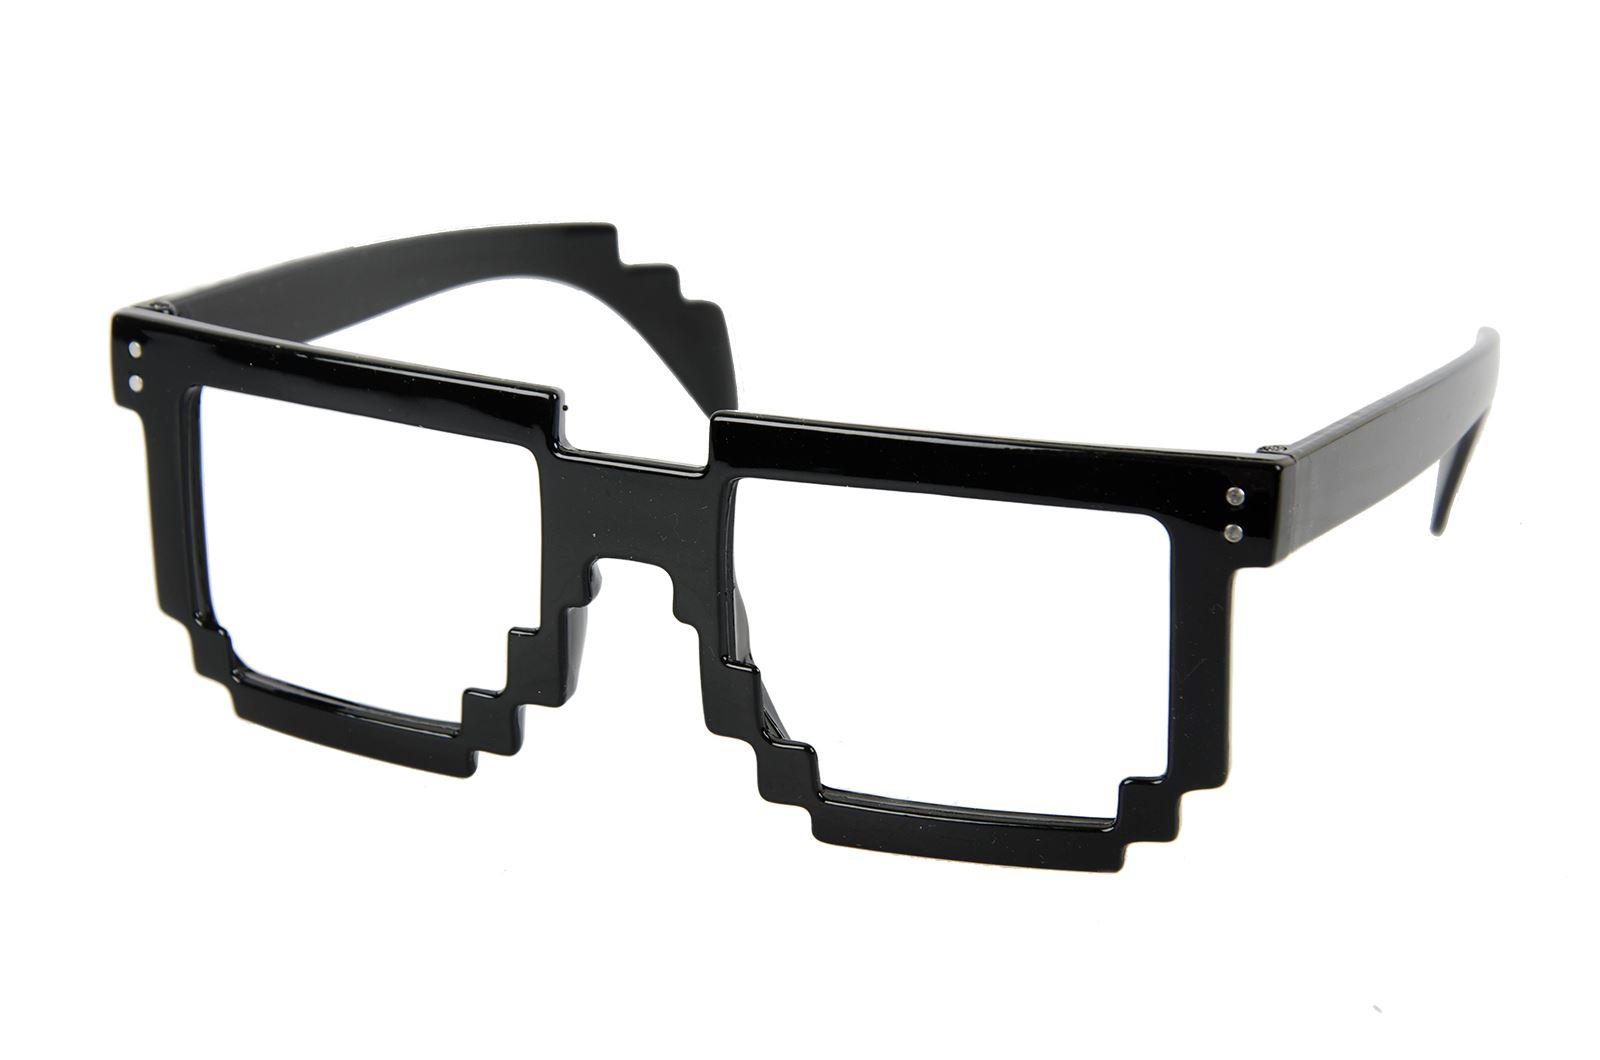 Pixelated Sunglasses  pixel glasses 8 bit geek nerd pixelated sunglasses fancy dress ebay